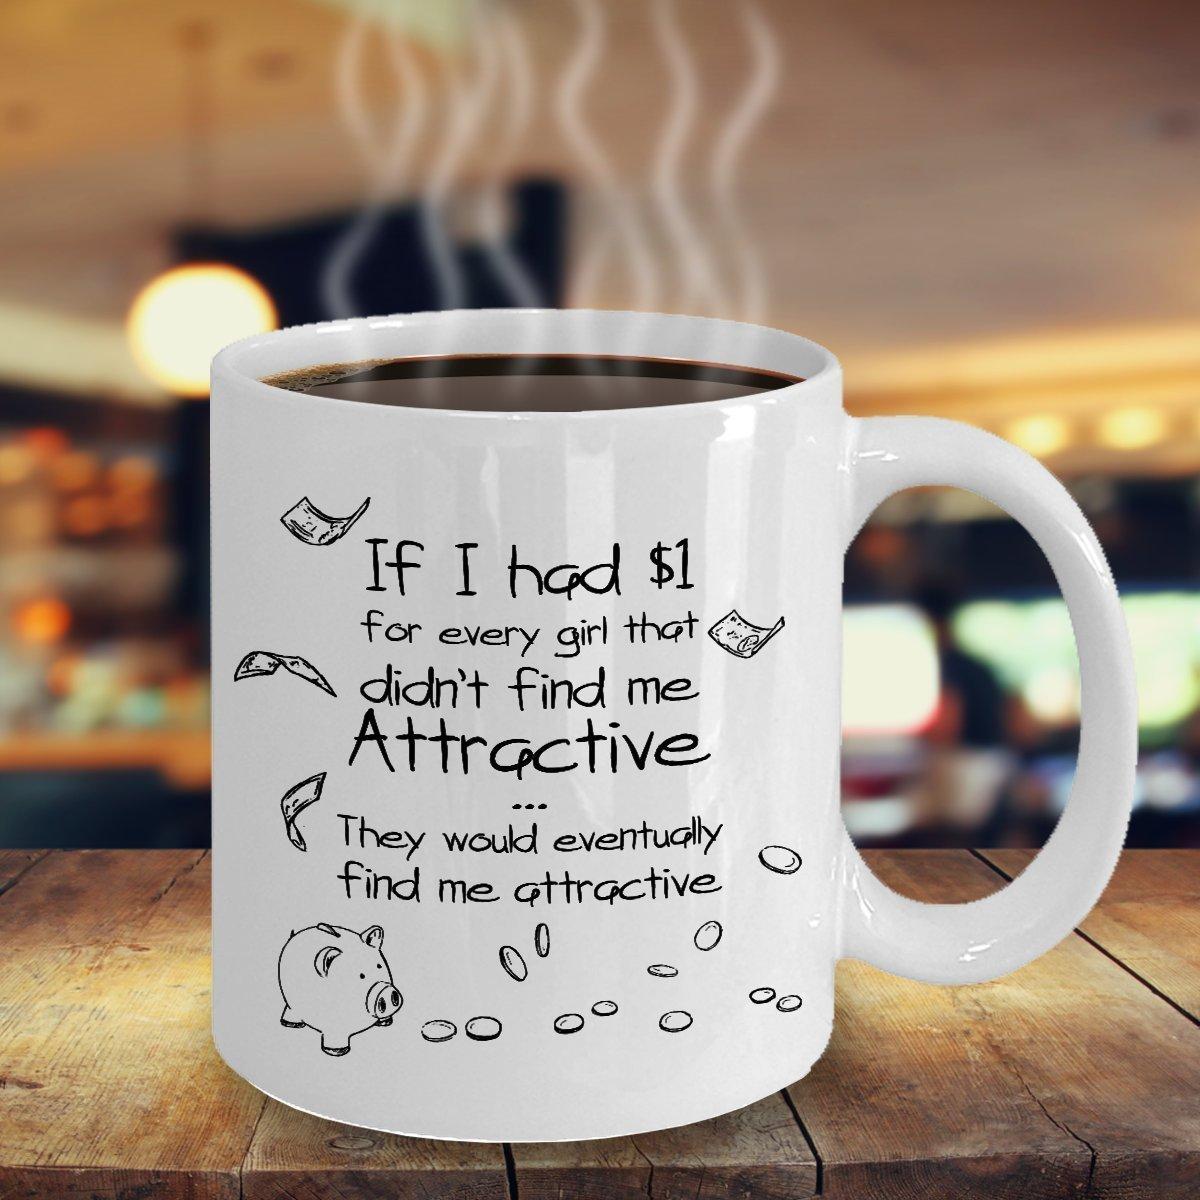 TeesCloset Dishwasher and Microwave Safe Funny Ceramic Mugs For Men